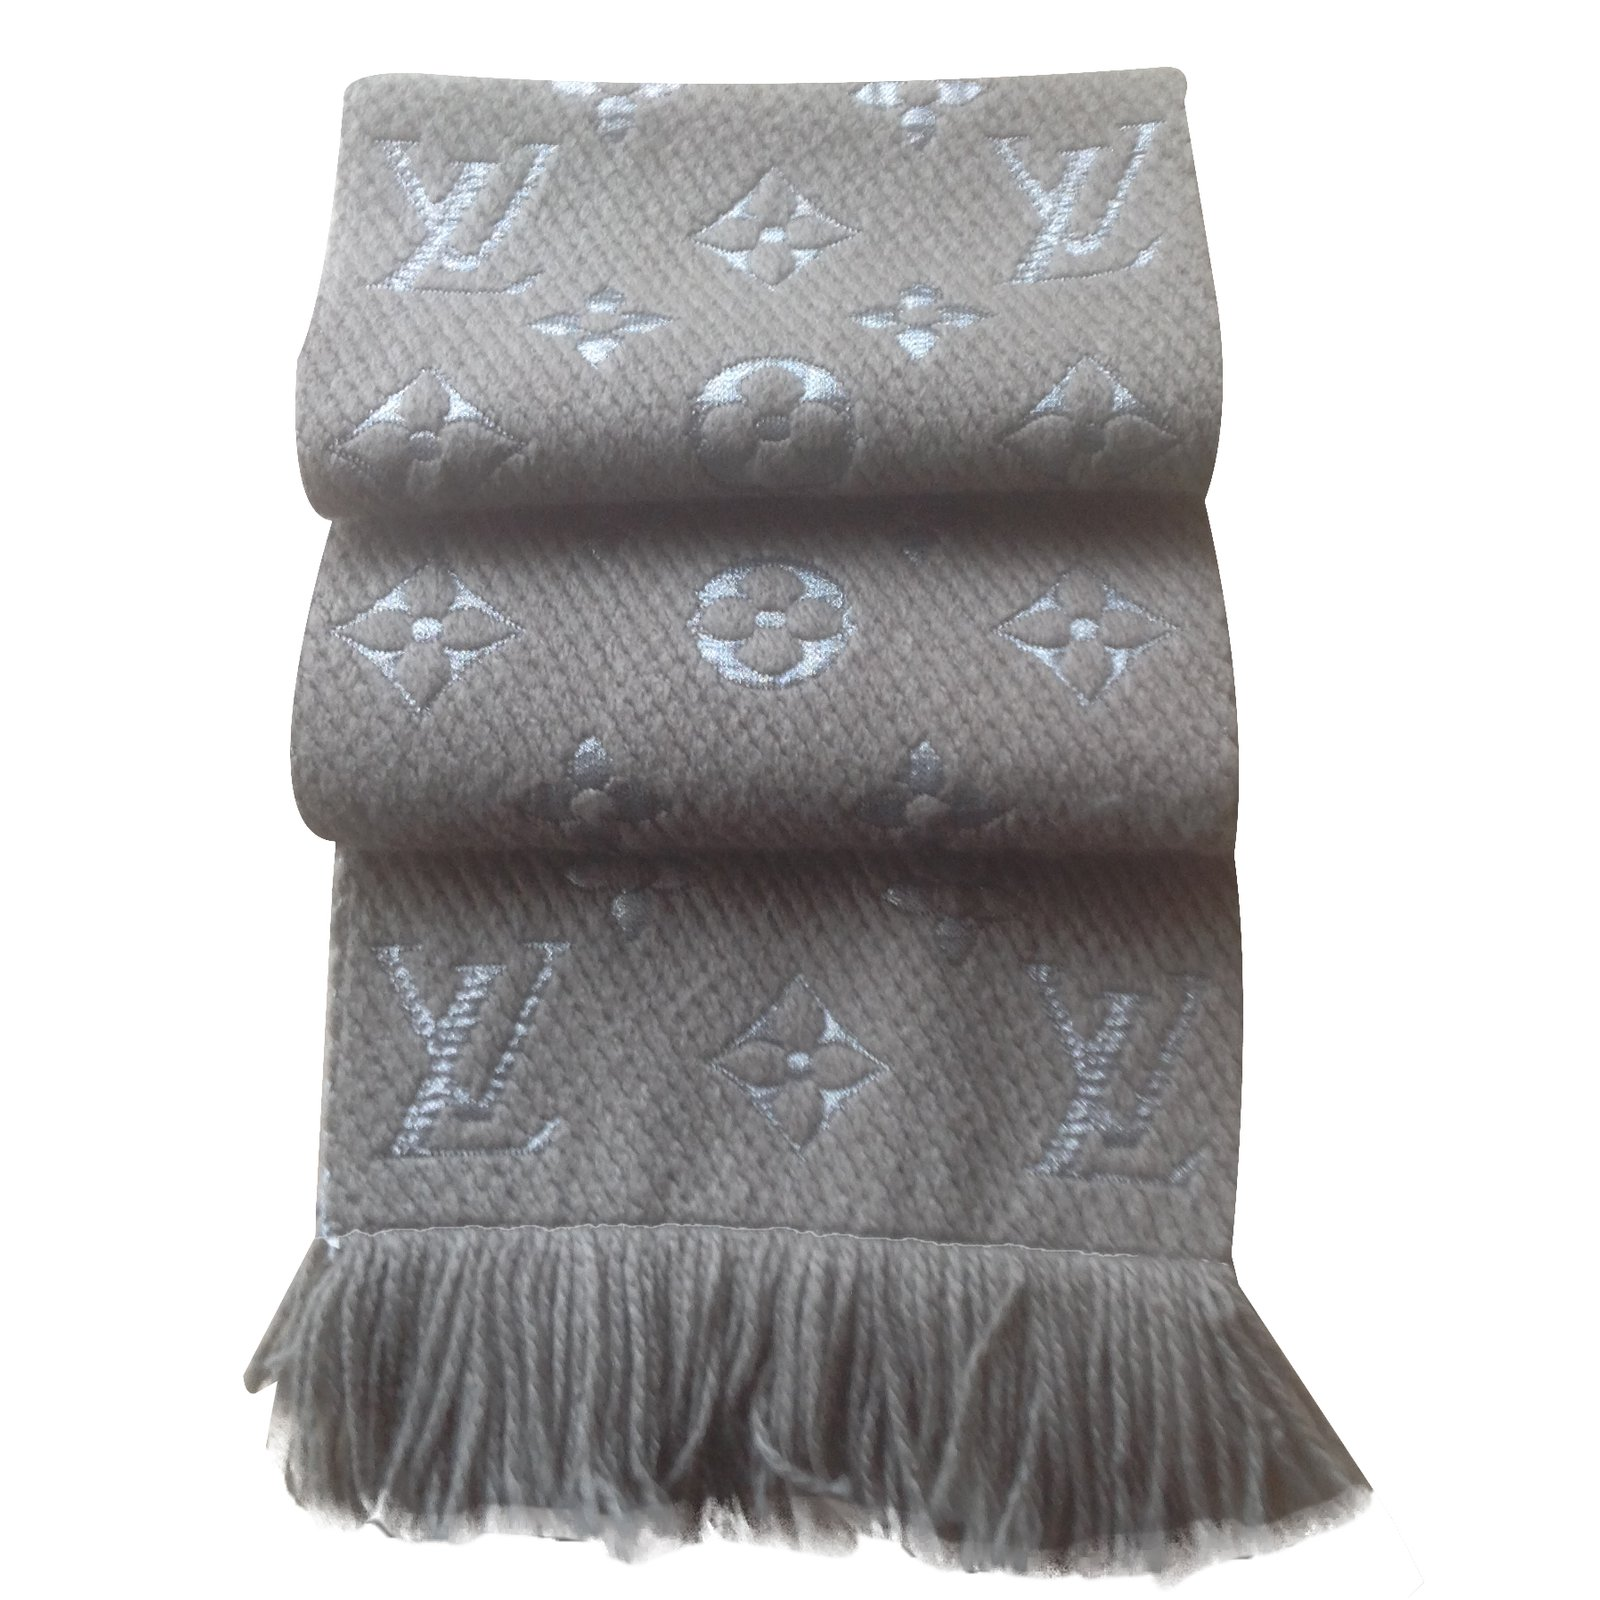 1ddb09e77f6 Echarpe Louis Vuitton Femme Aliexpress